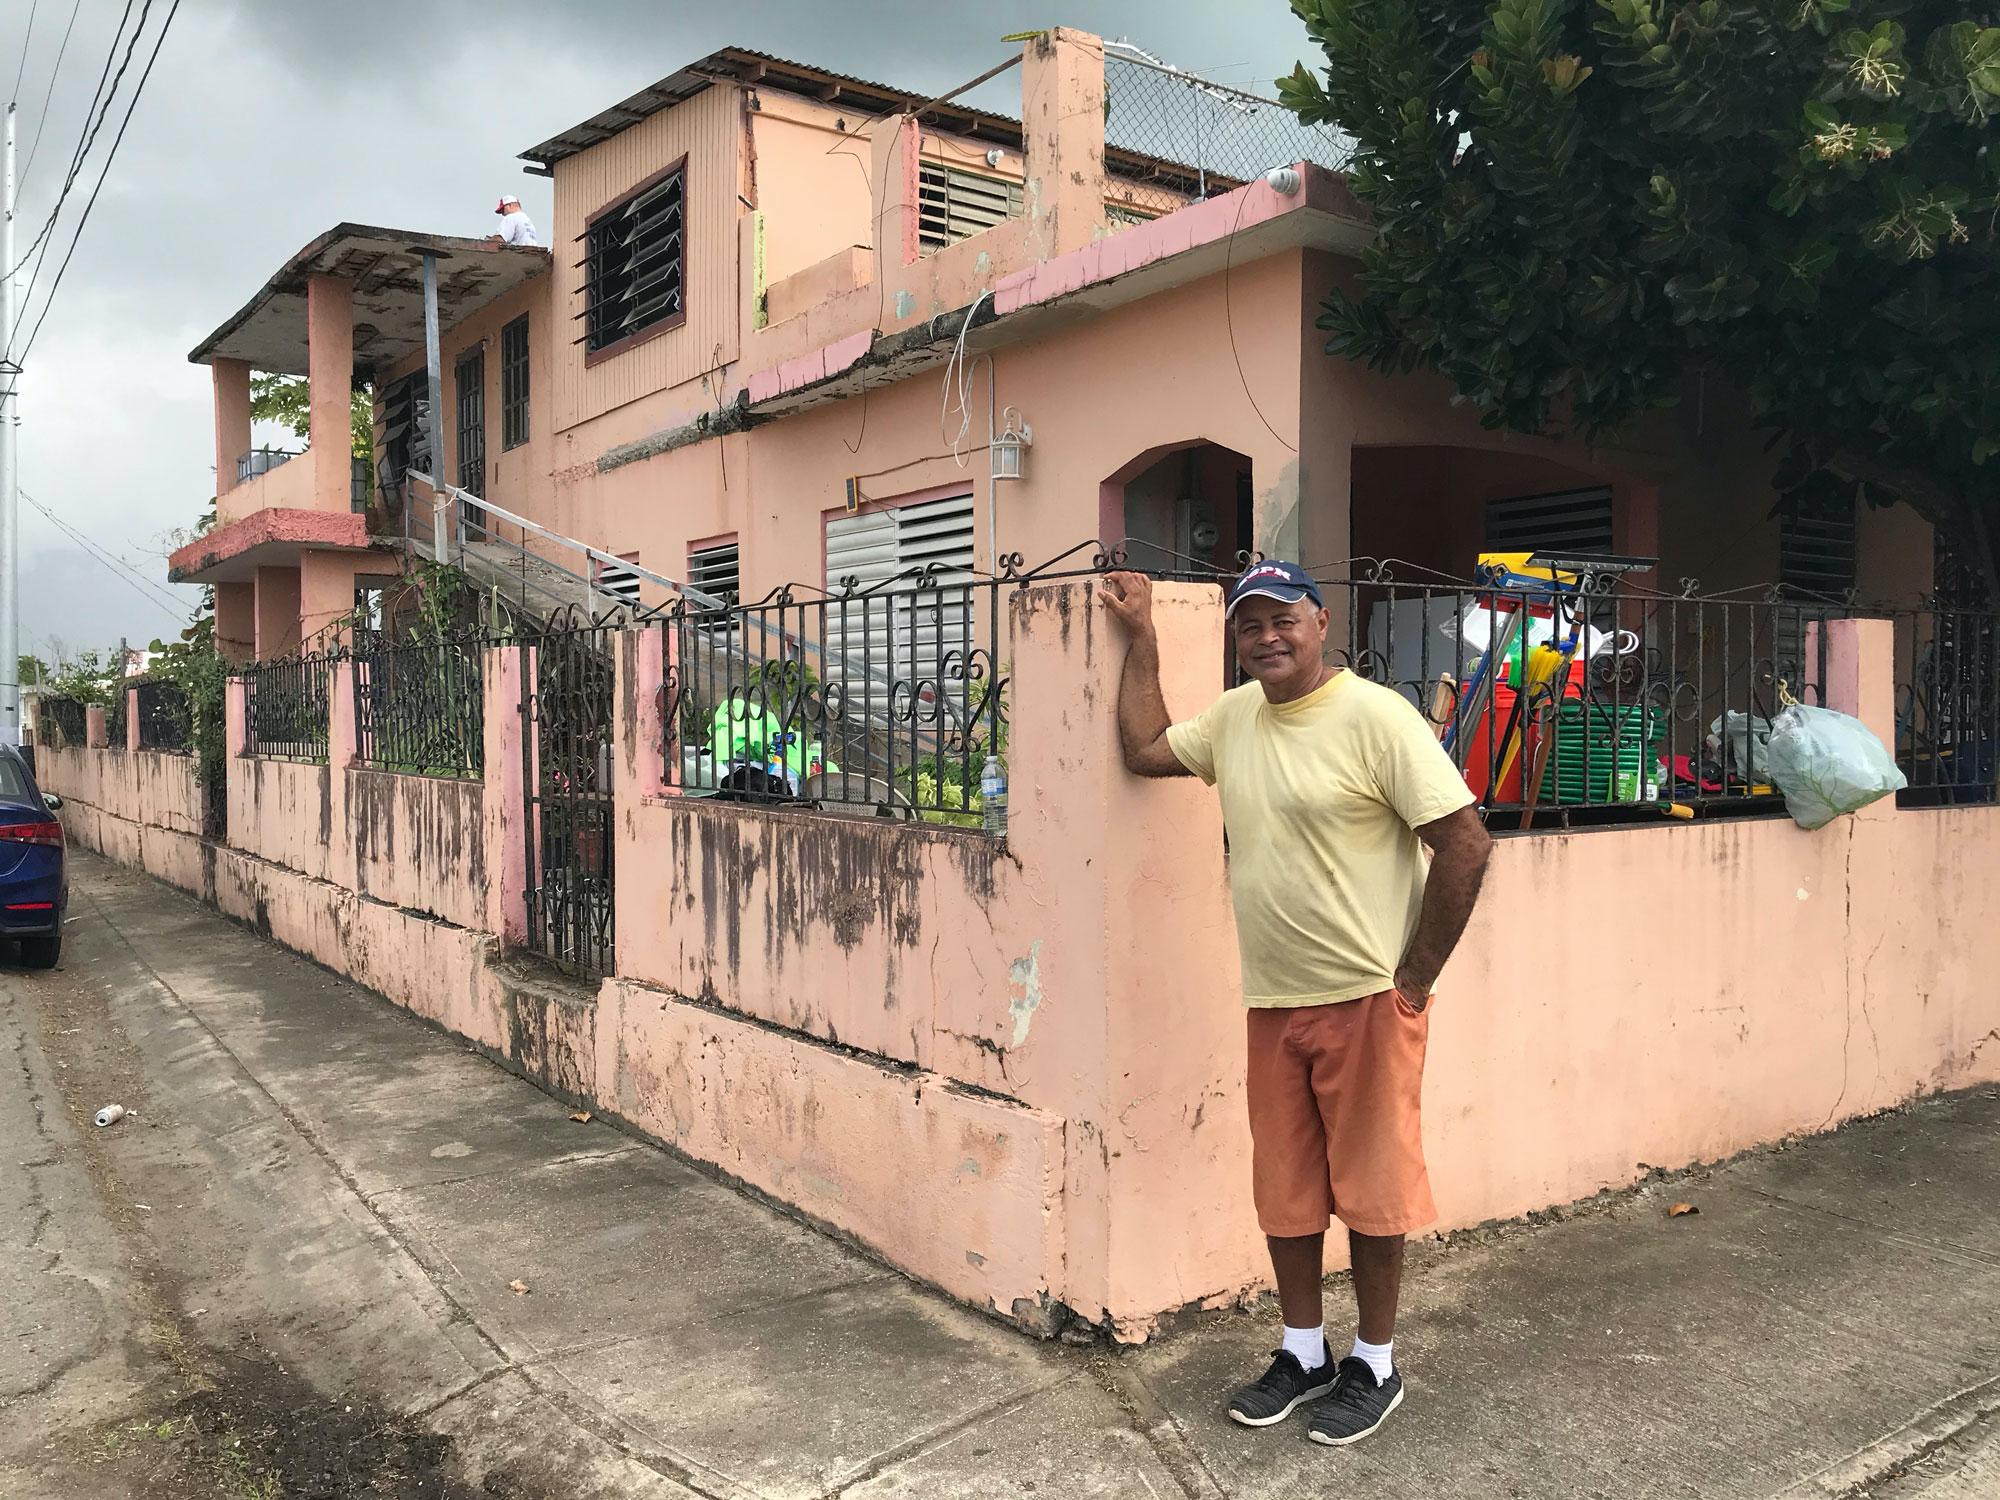 Juanito Borques outside his home.